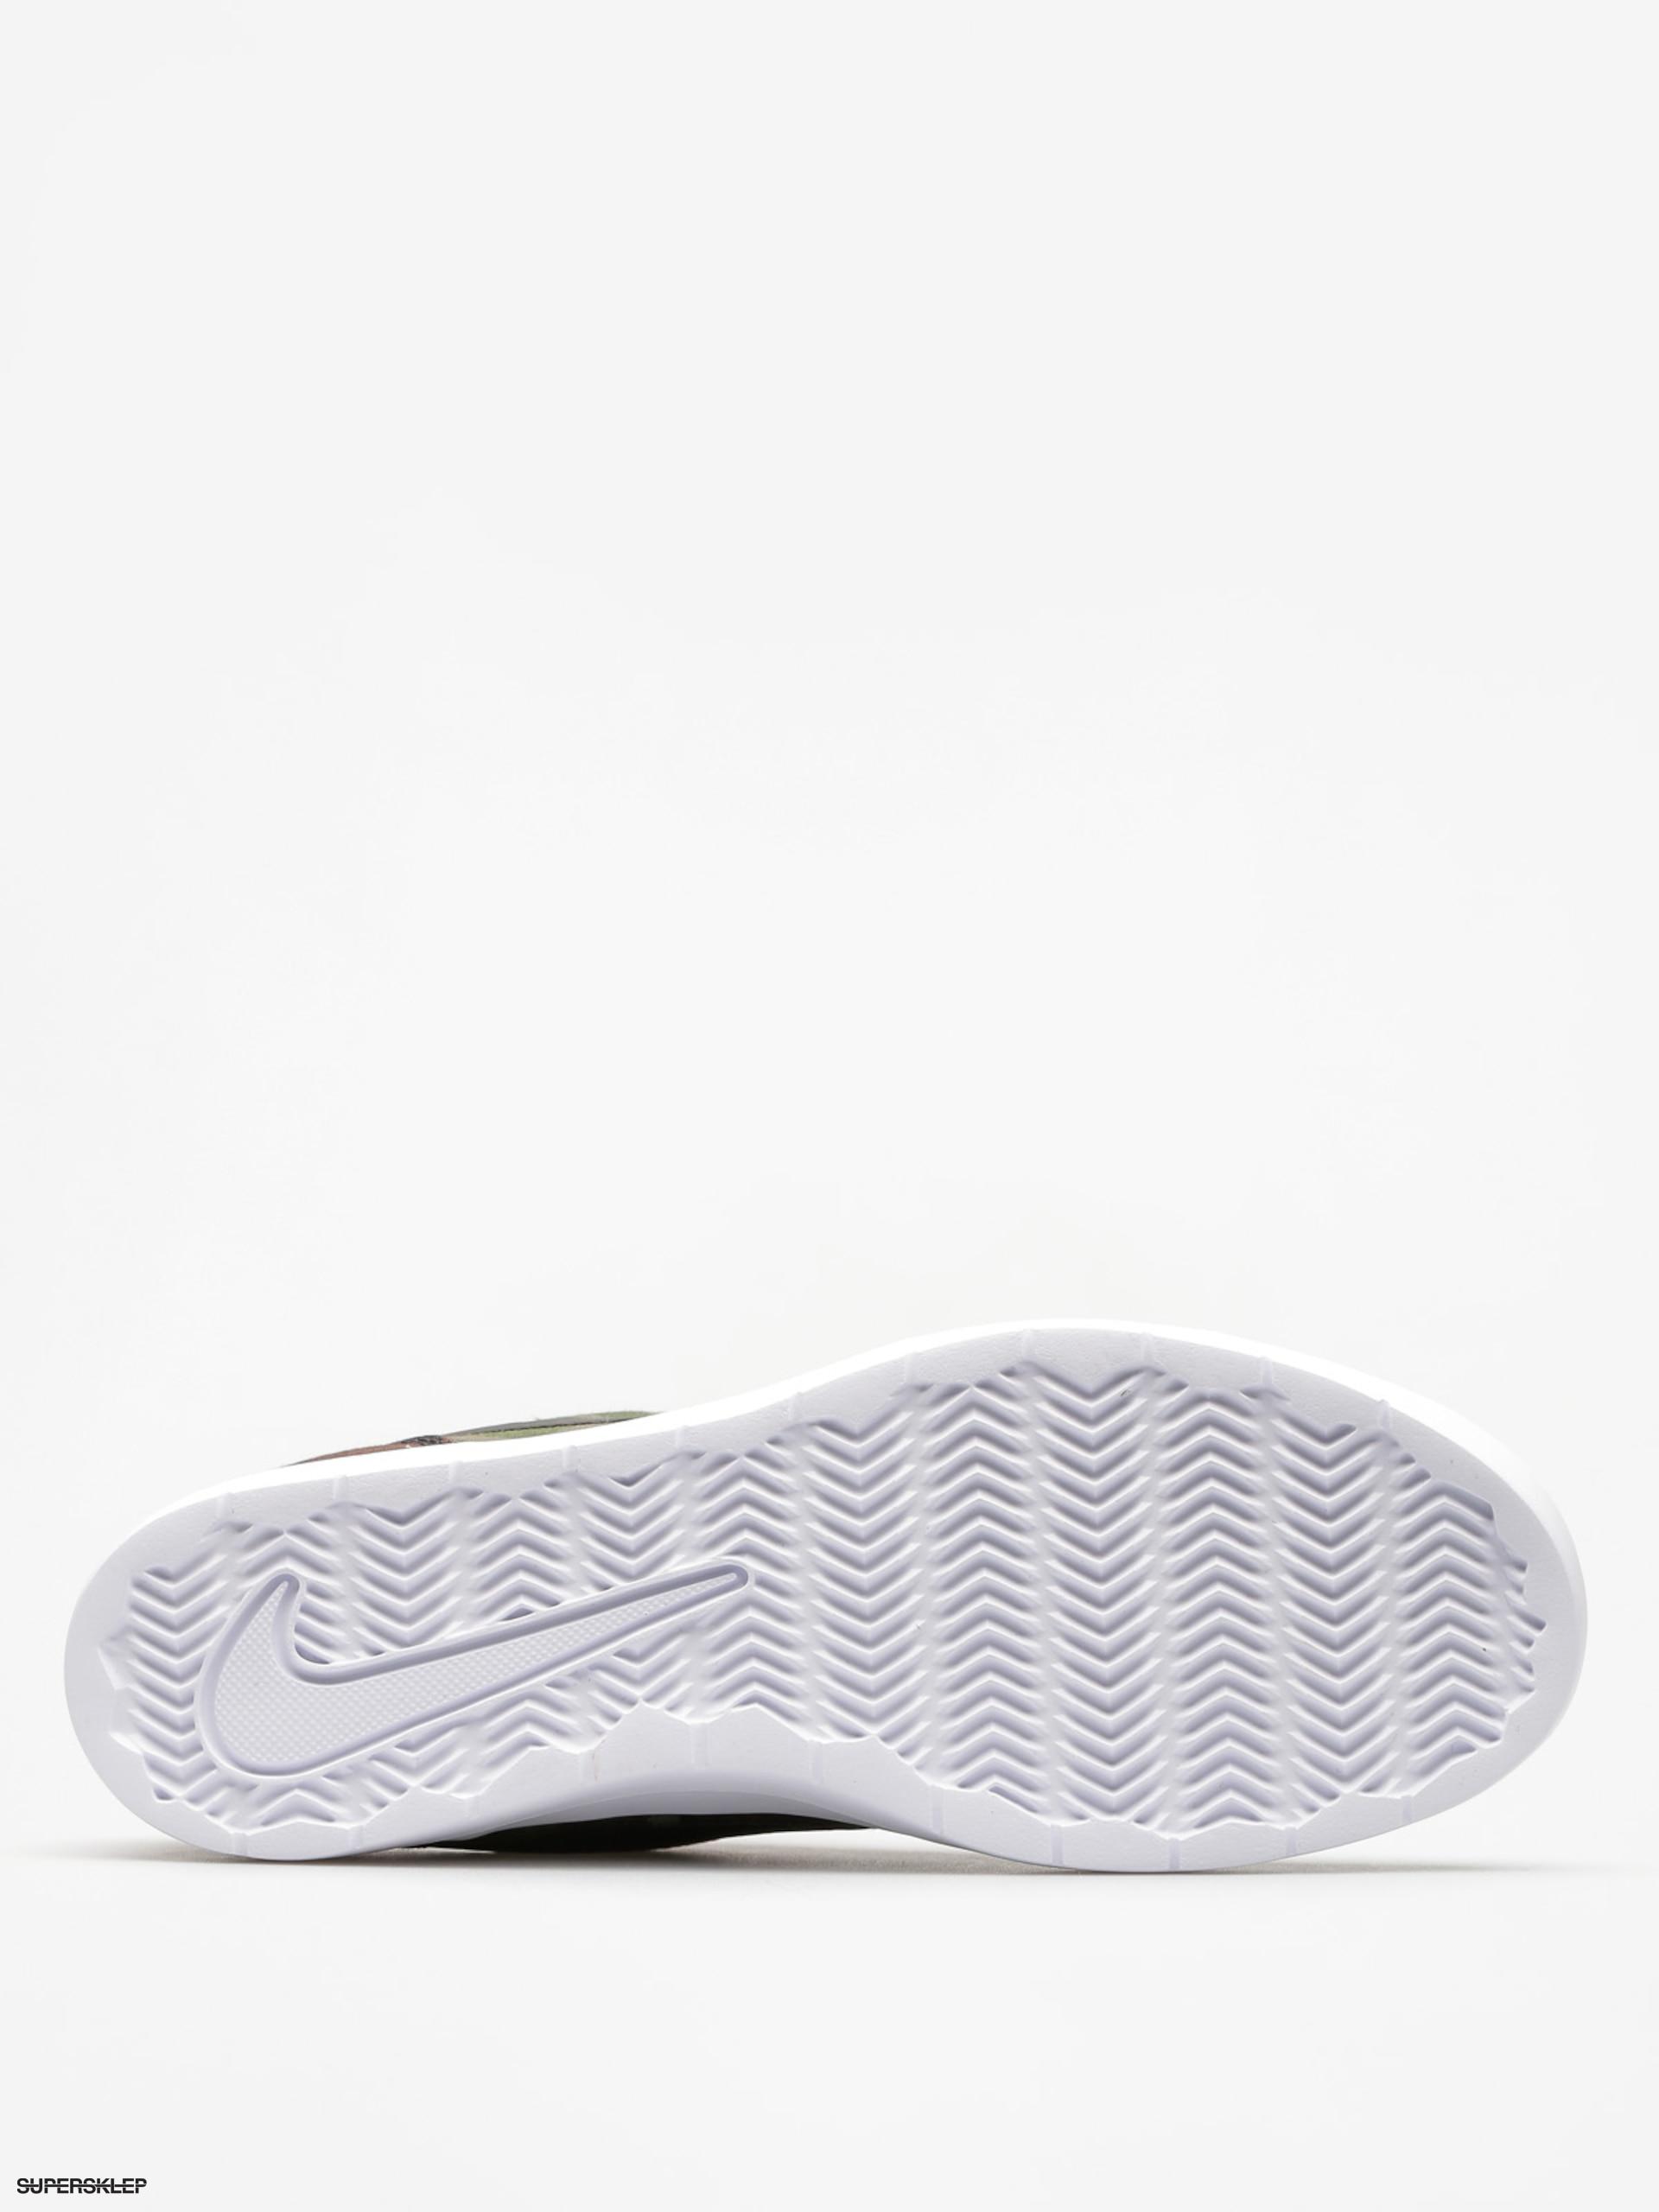 Buty Nike SB Sb Portmore II Ultralight (blackblack white)